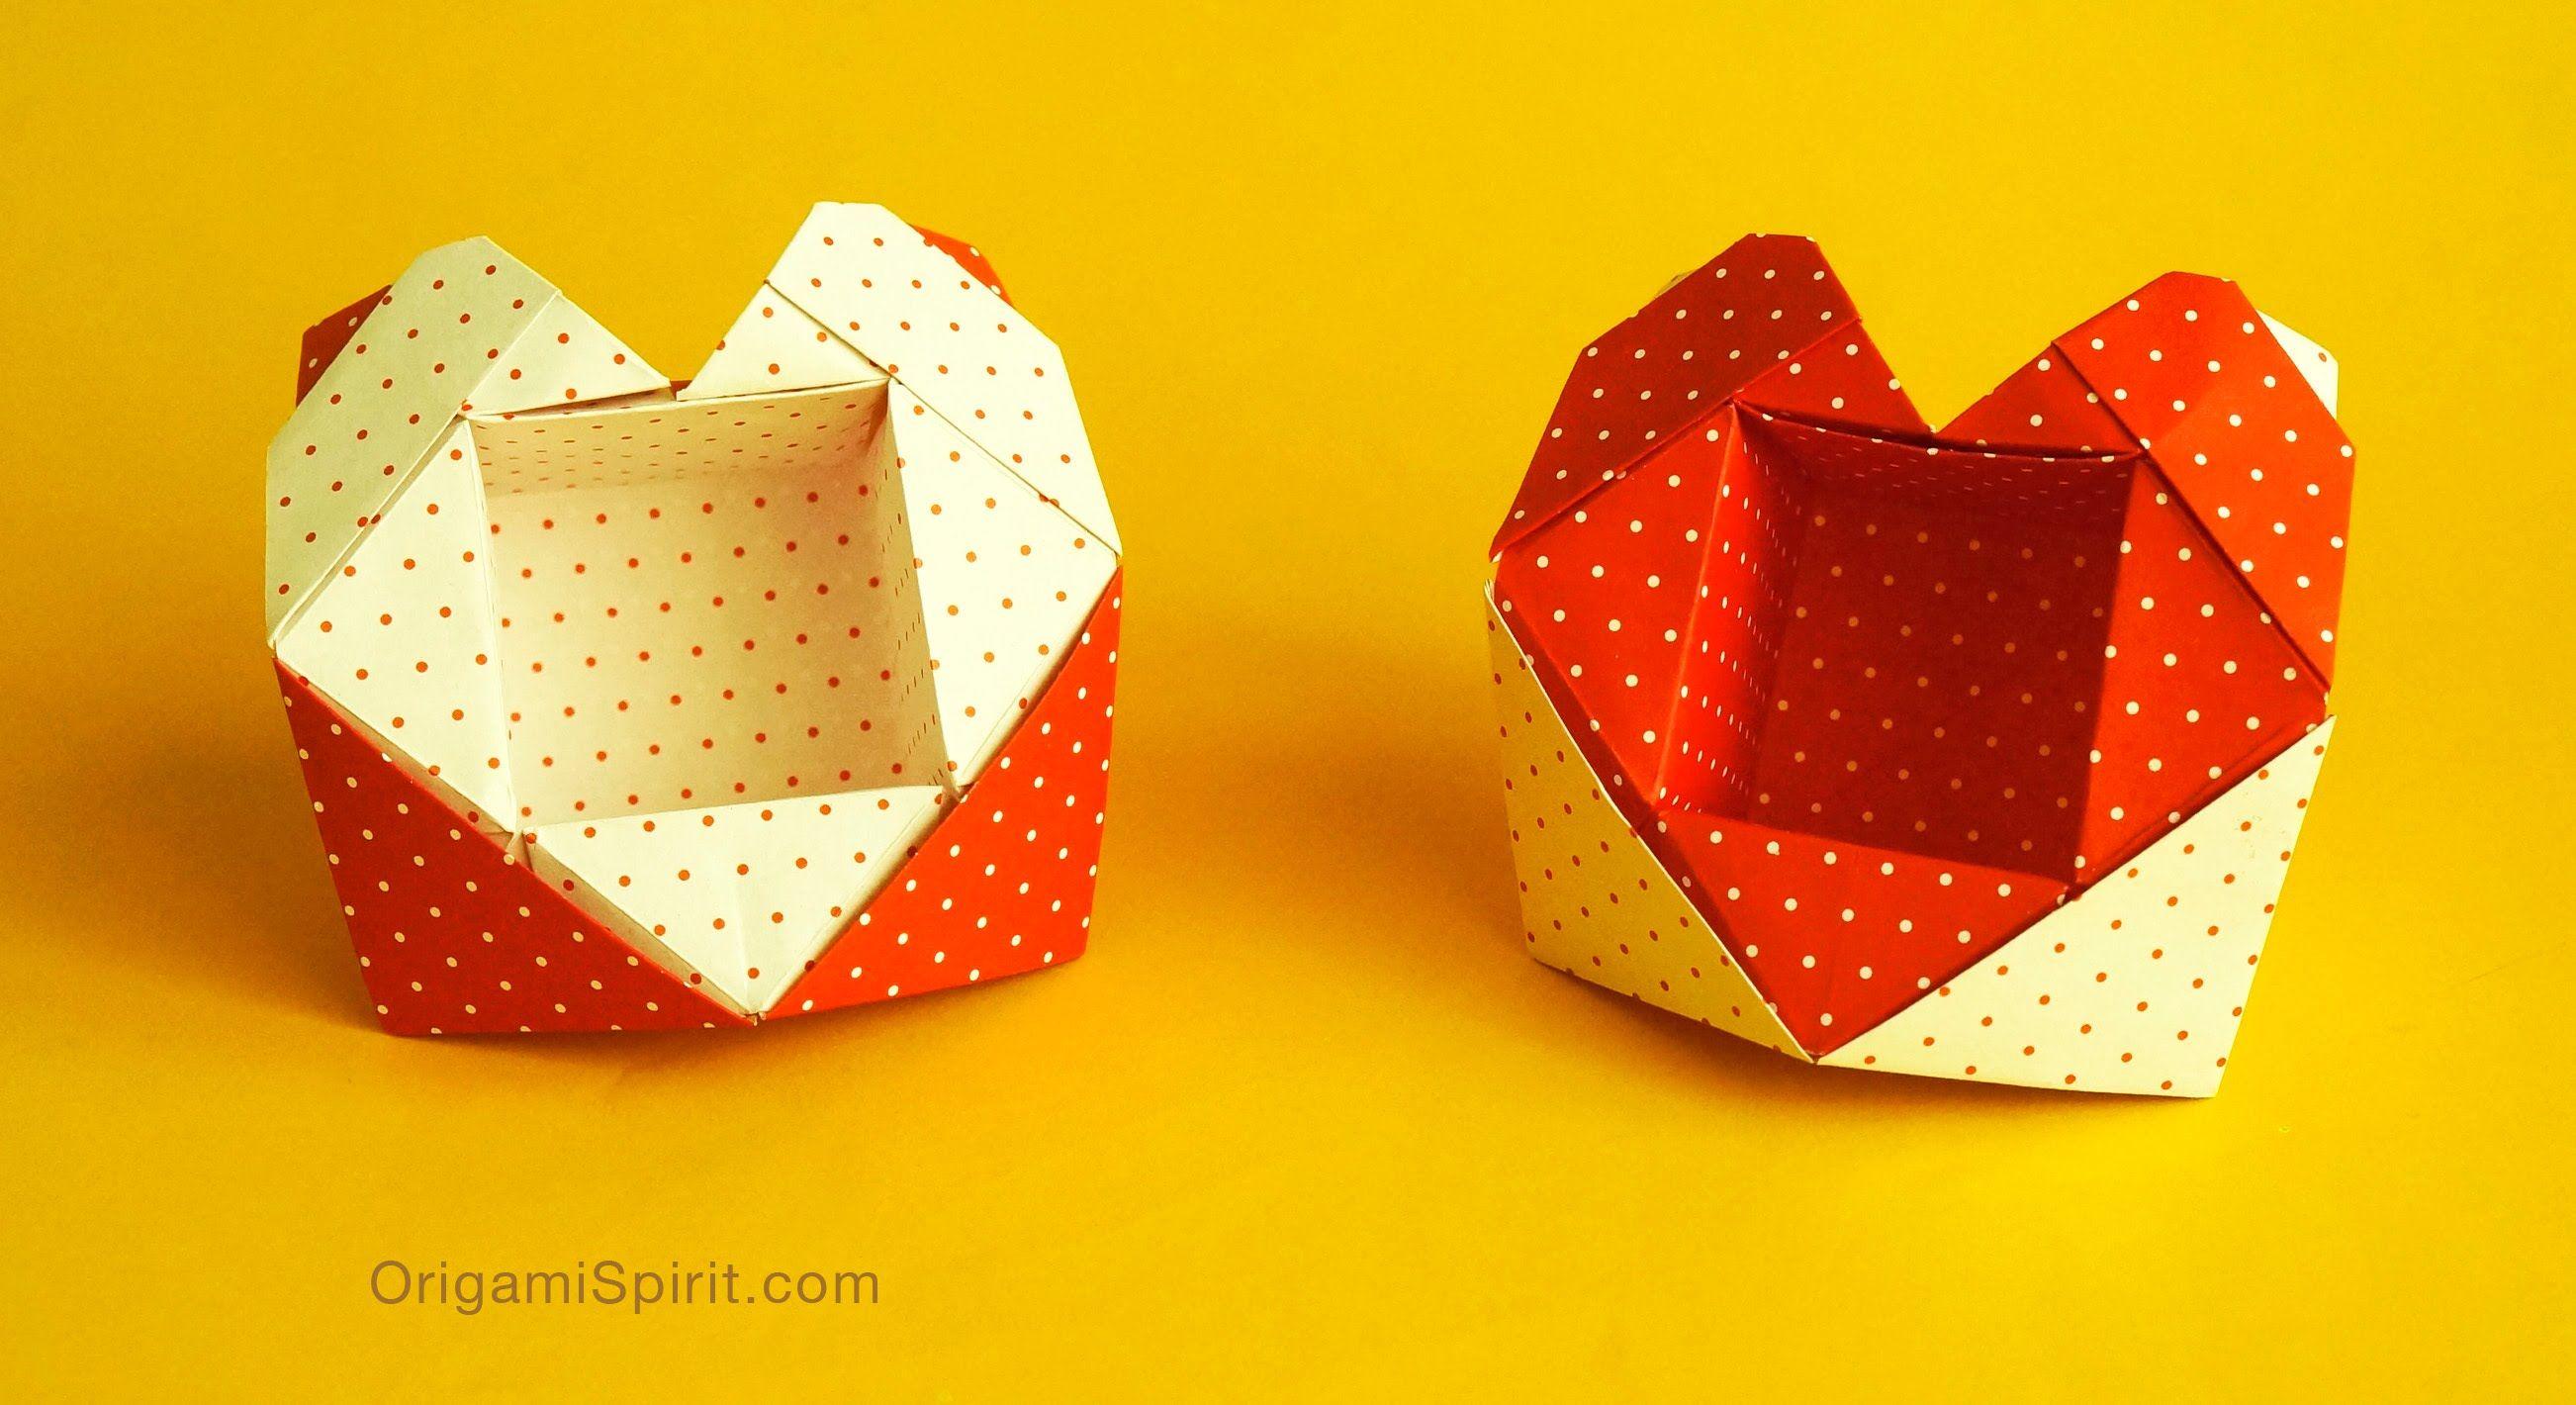 Origami valentine heart box valentines day offers a good excuse origami valentine heart box valentines day offers a good excuse to make some sweet origami jeuxipadfo Choice Image